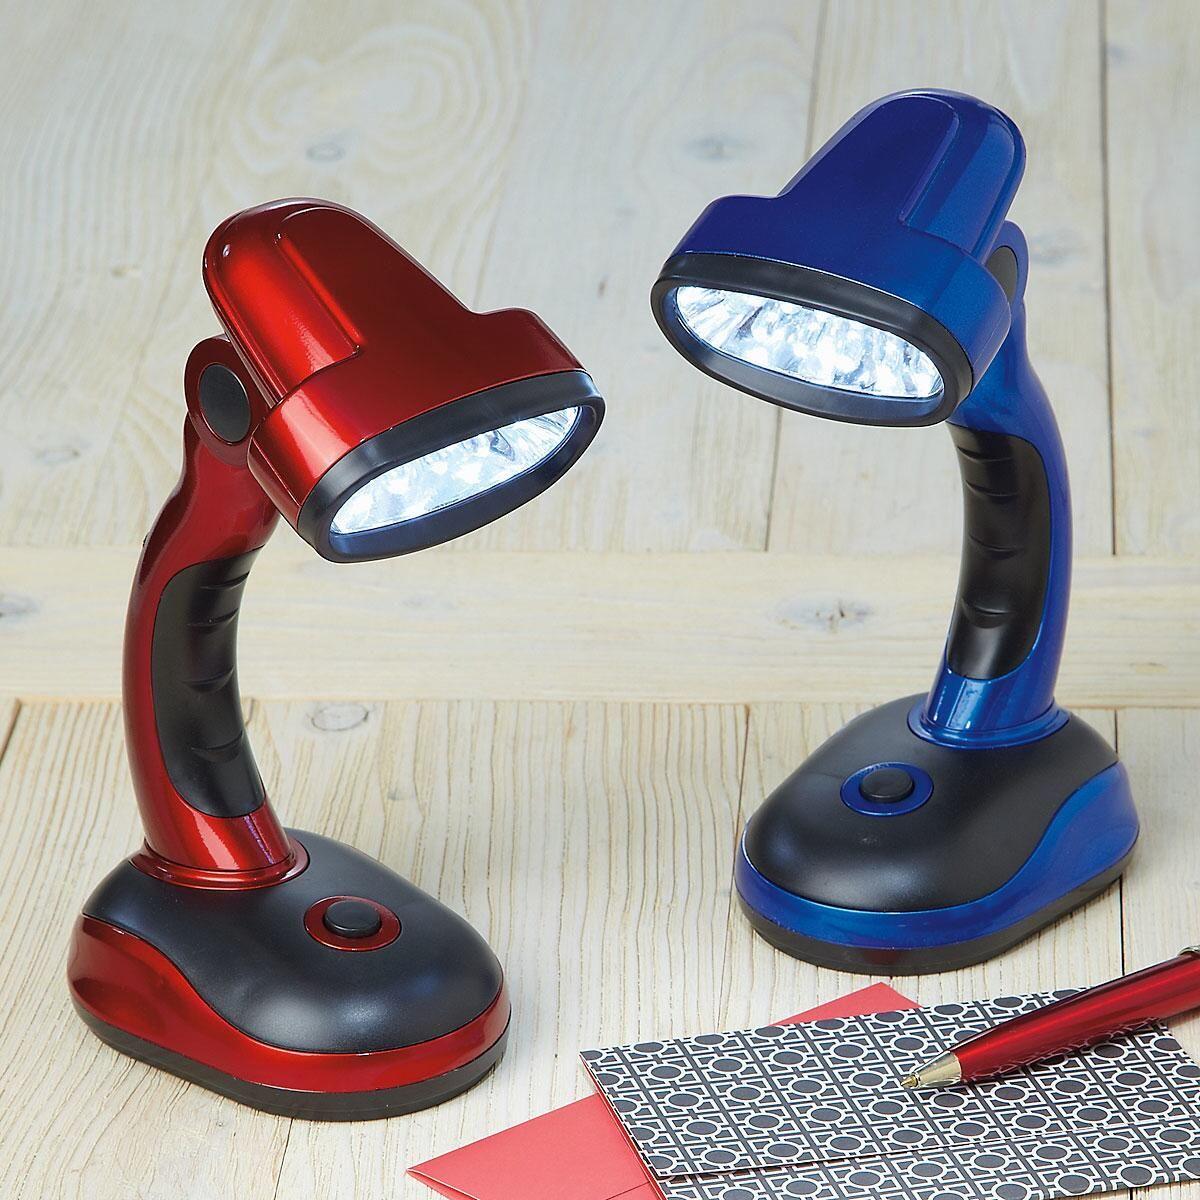 Cordless LED Desk Lamps